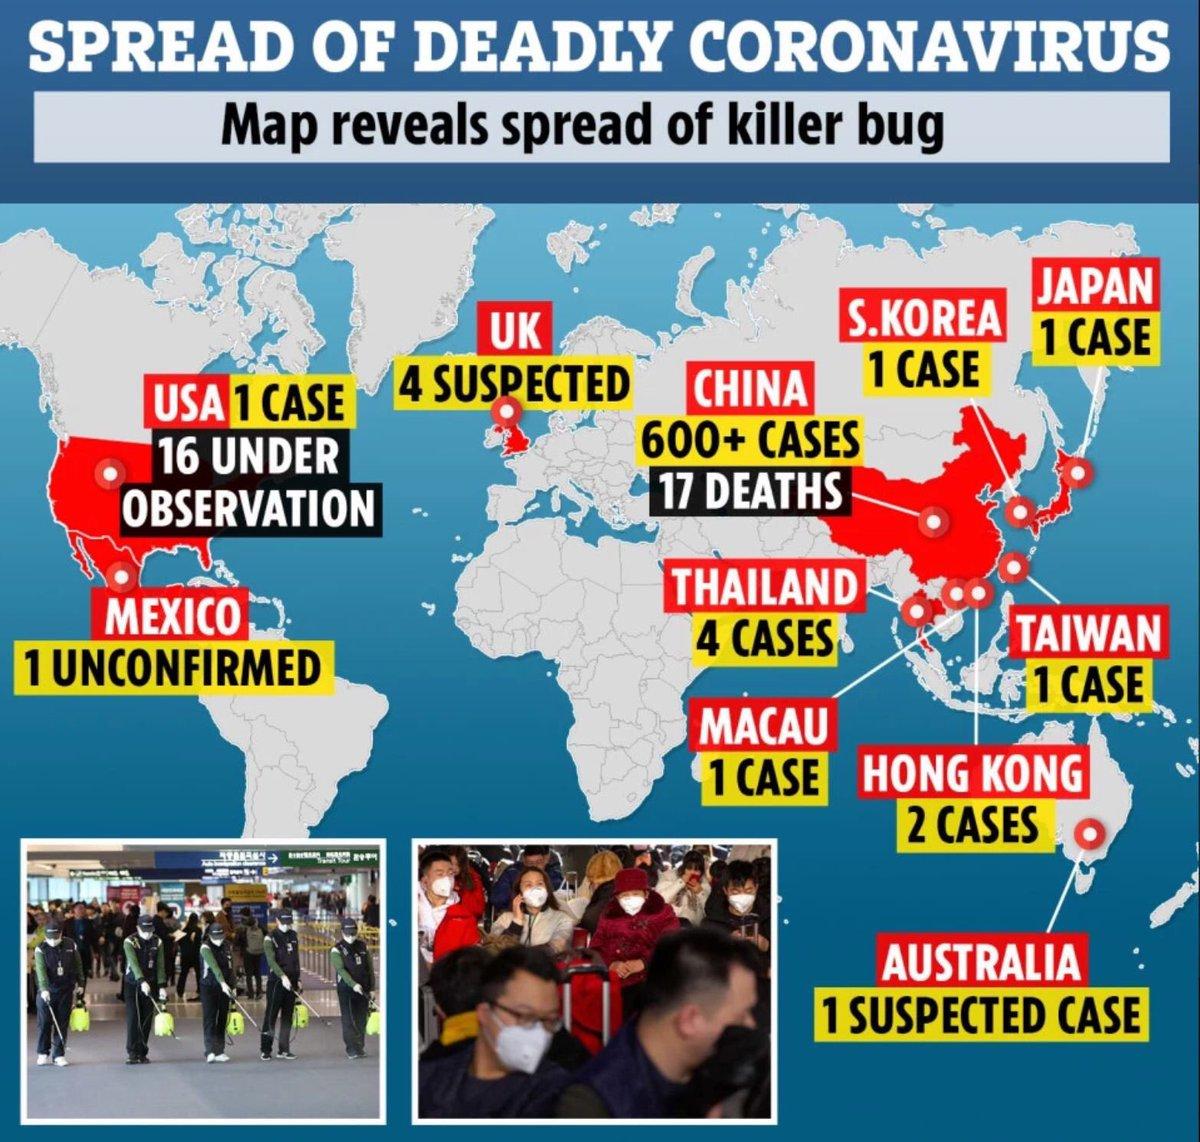 Chinese Communist dog is controlling World Health Organisation #StandWithHongKong #FreeHongKong <br>http://pic.twitter.com/2LSzsaXuKT